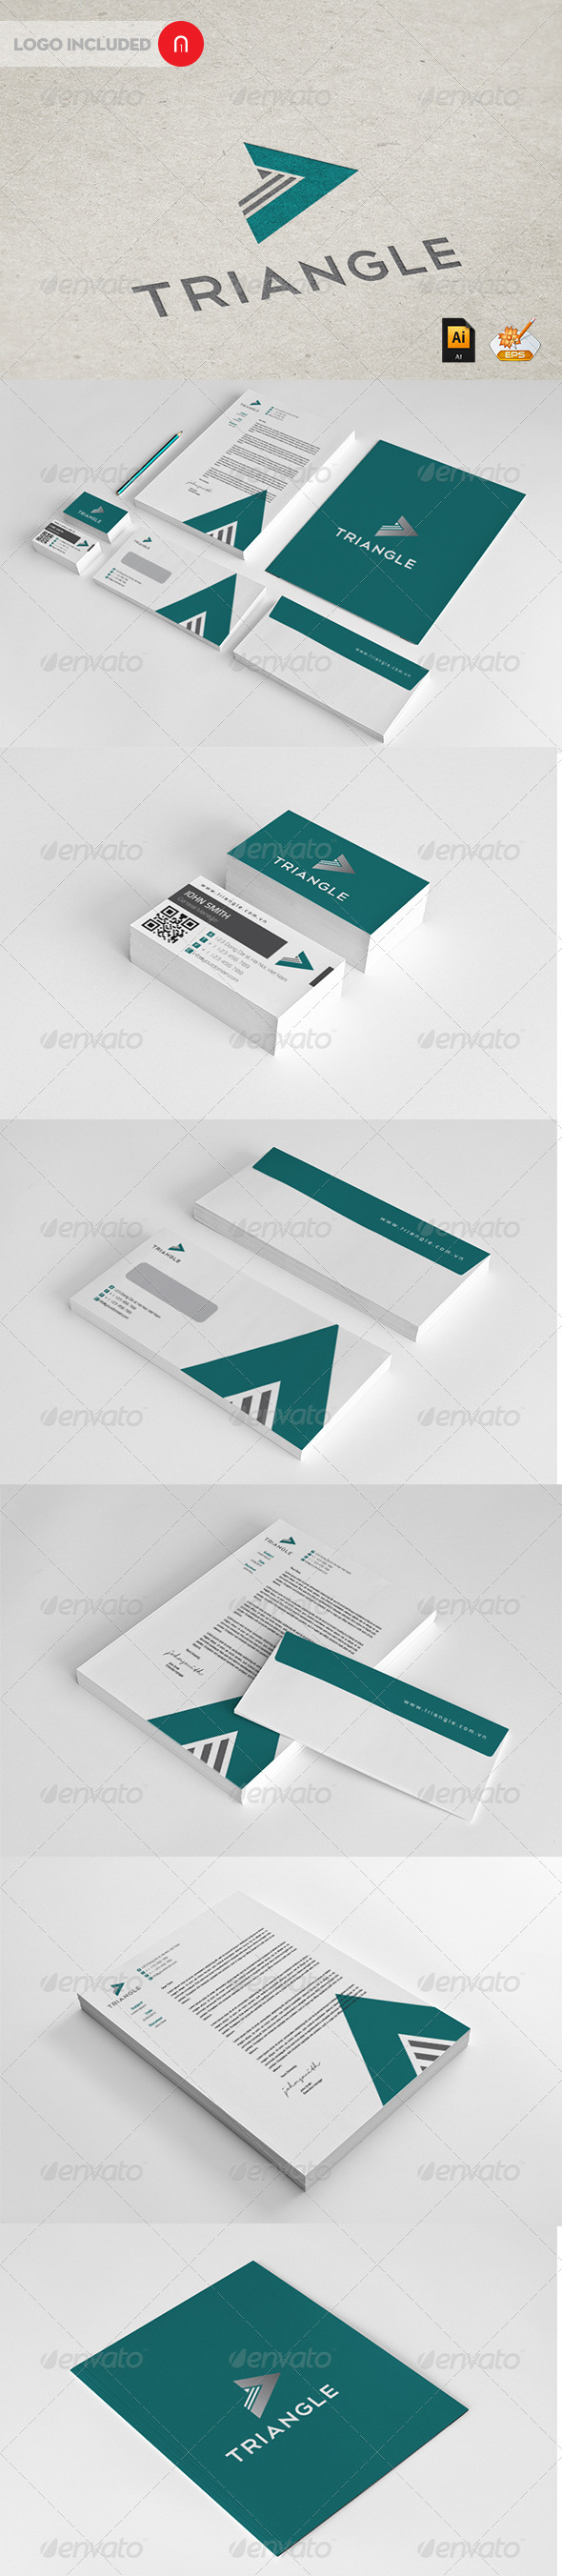 Triangle Corporate Identity - Stationery Print Templates